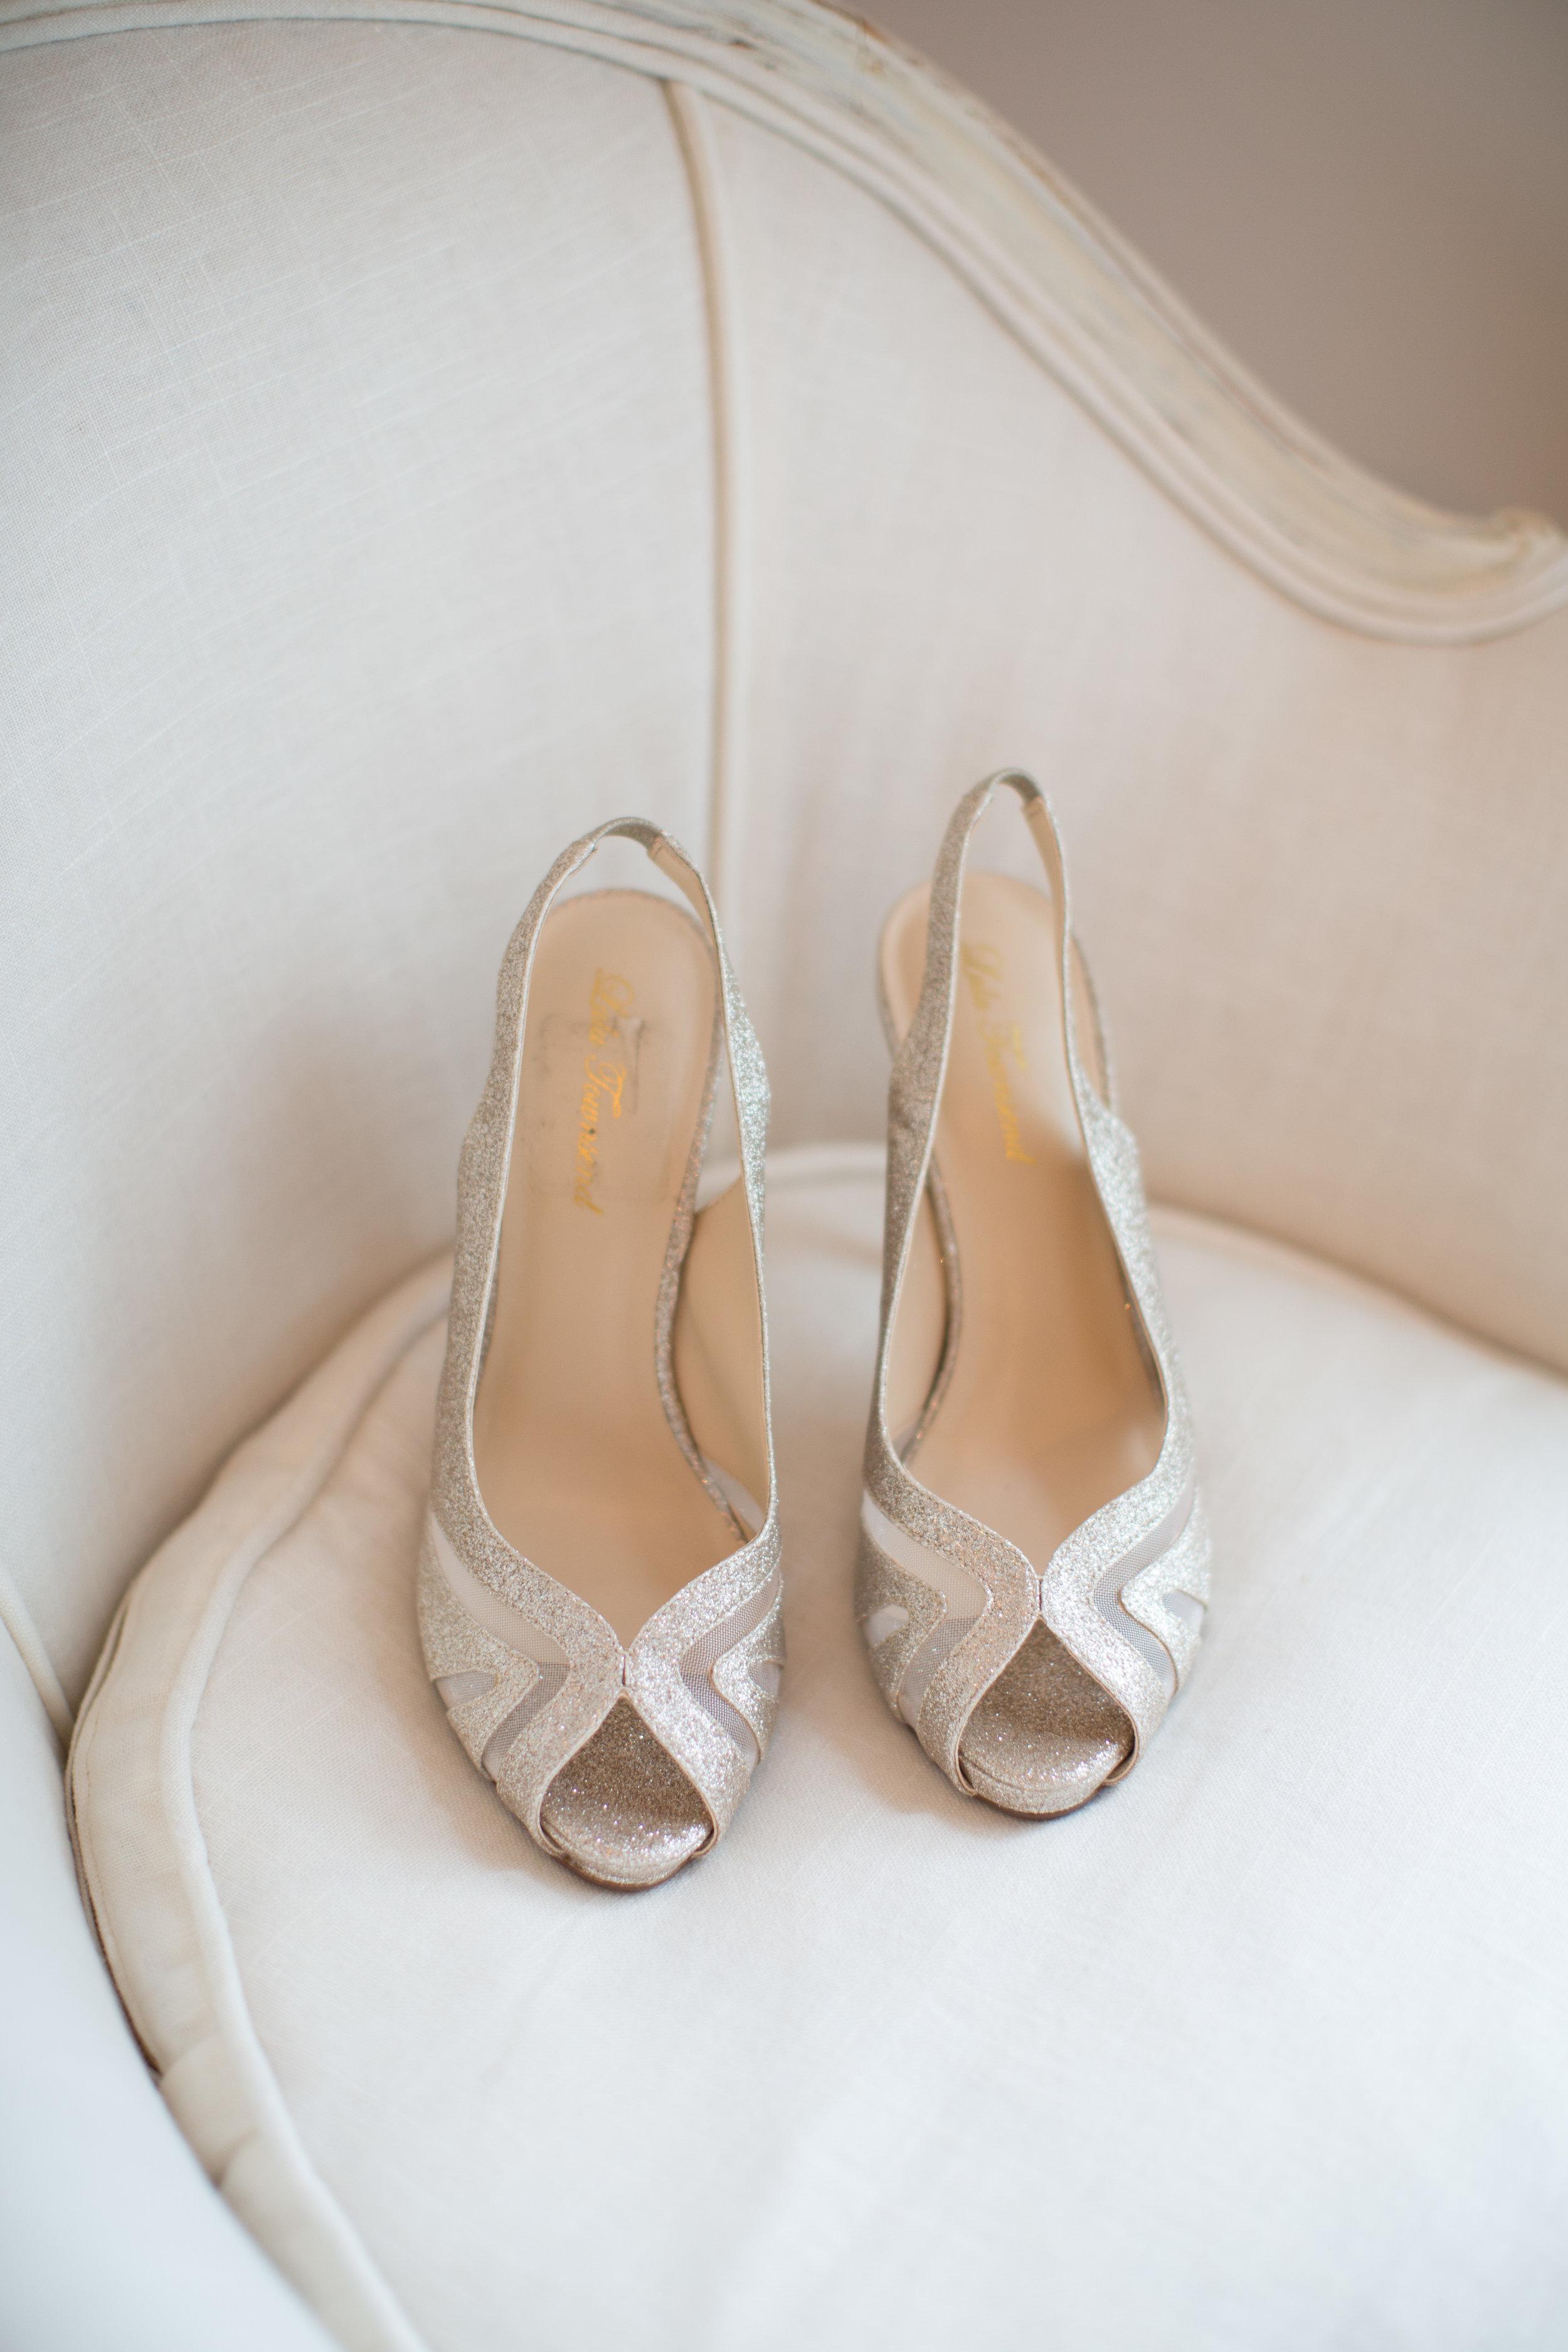 02282-raleighncweddingbridalshoesraleighncweddingbridalshoes.jpg